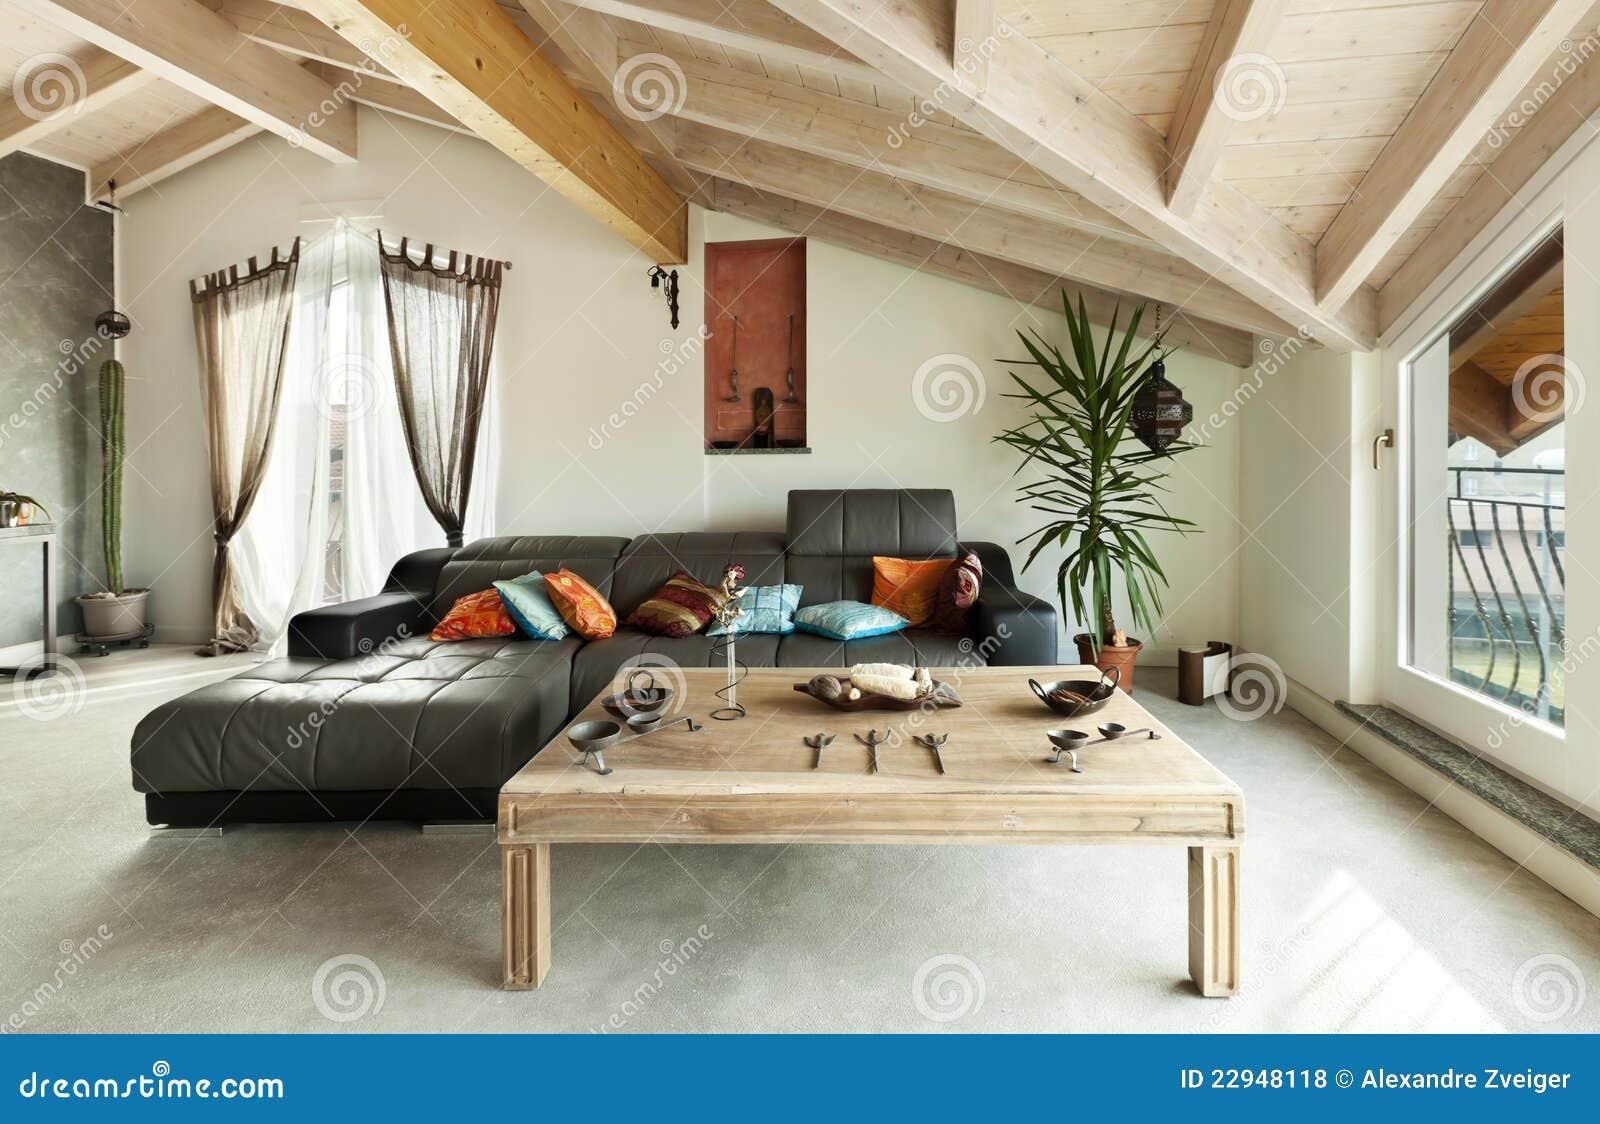 Ethnic furniture living room royalty free stock for Arredamenti loft